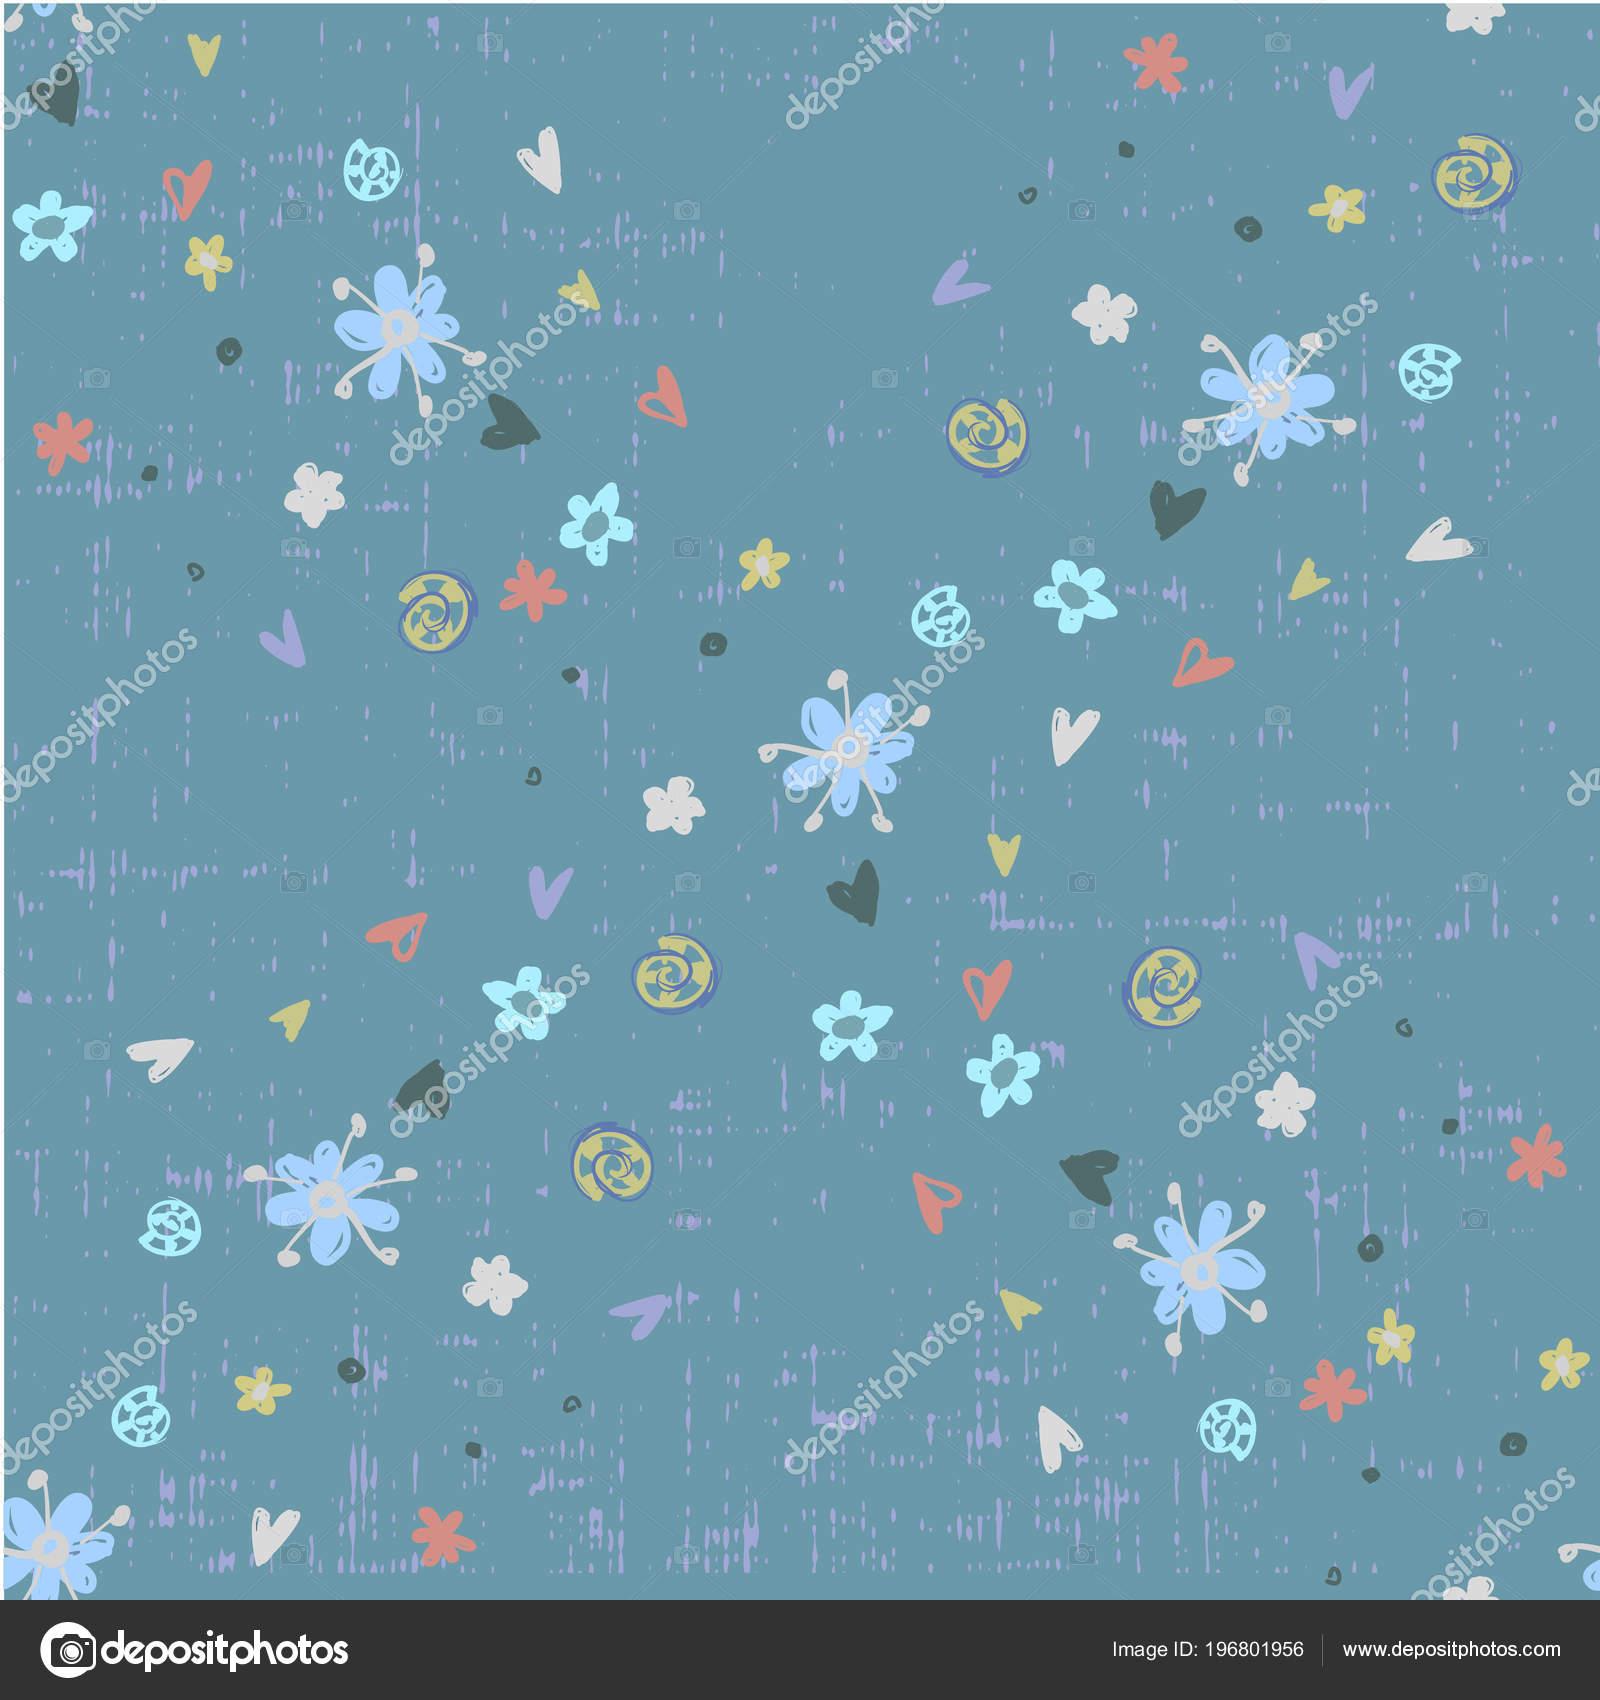 f3f7a497ac9 Χαριτωμένο αφηρημένη φαντασία χωρίς ραφή με μικρά πολύχρωμα άνθη σε ...